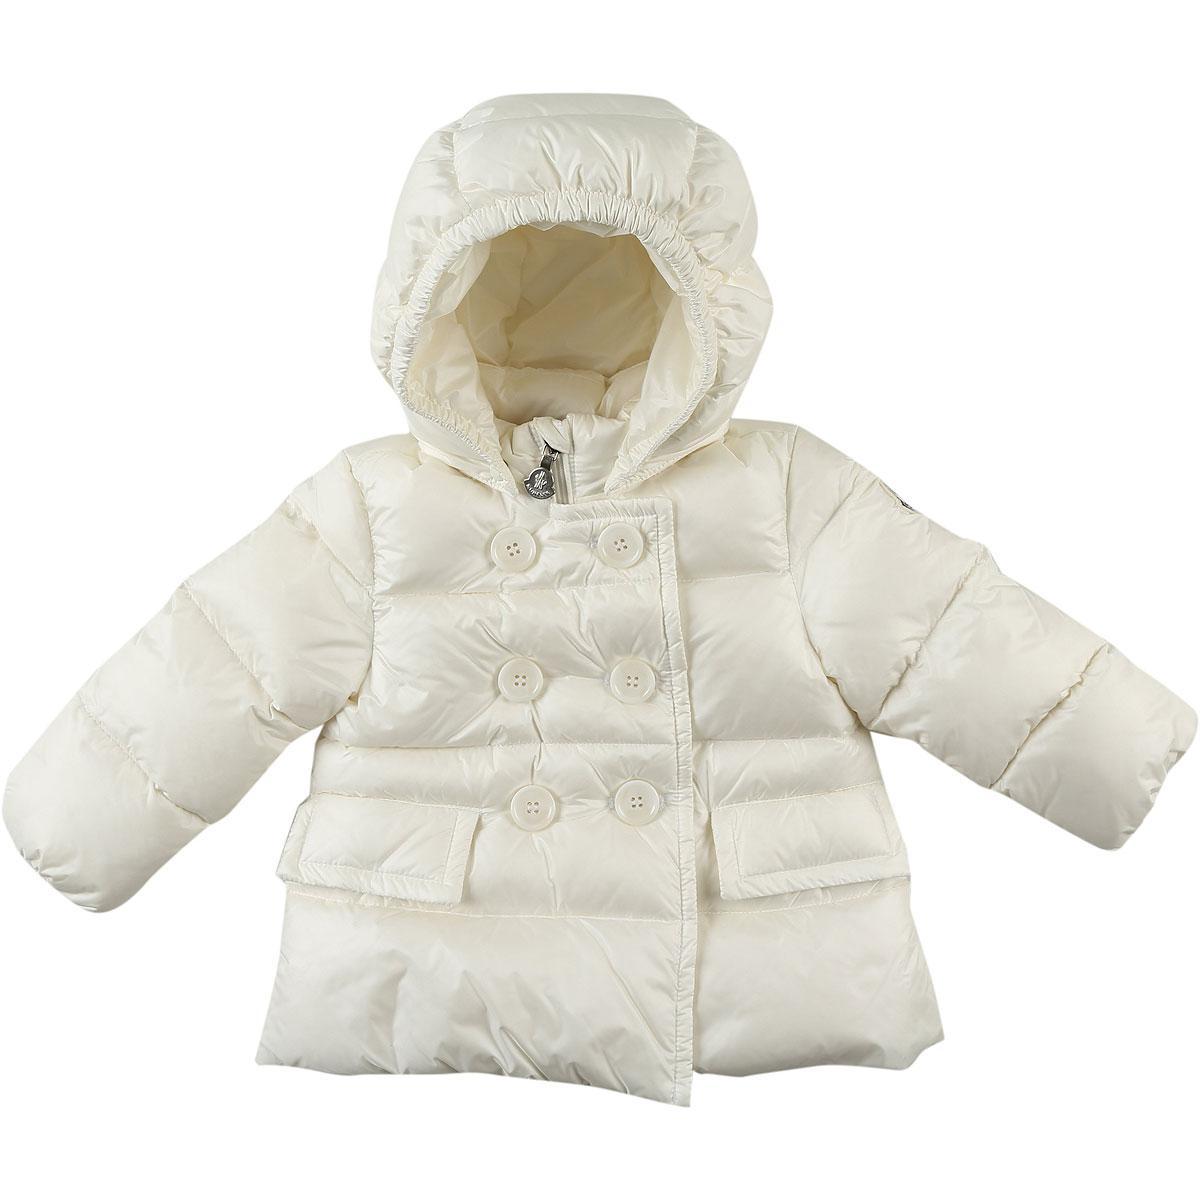 Lyst - Abrigos de Plumas para Bebé Niña Baratos en Rebajas Outlet ... 3c0fe6f523c